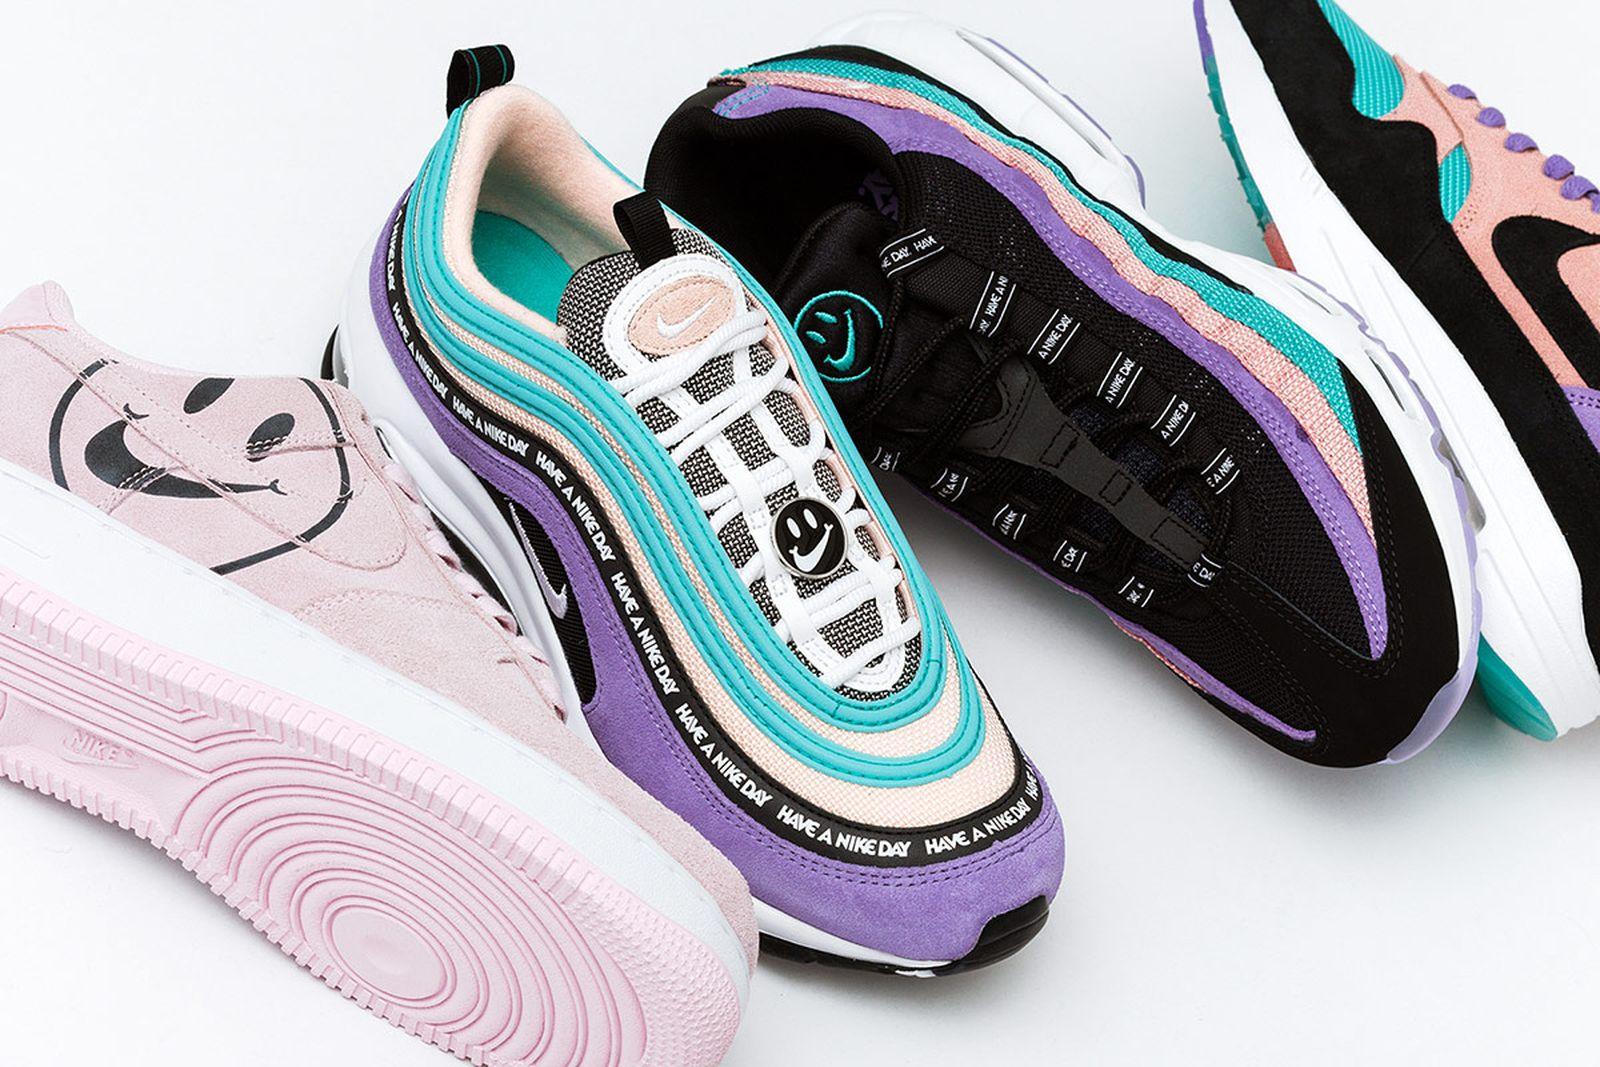 masculino desencadenar Expectativa  Nike Have a Nike Day Collection: Where to Buy Today